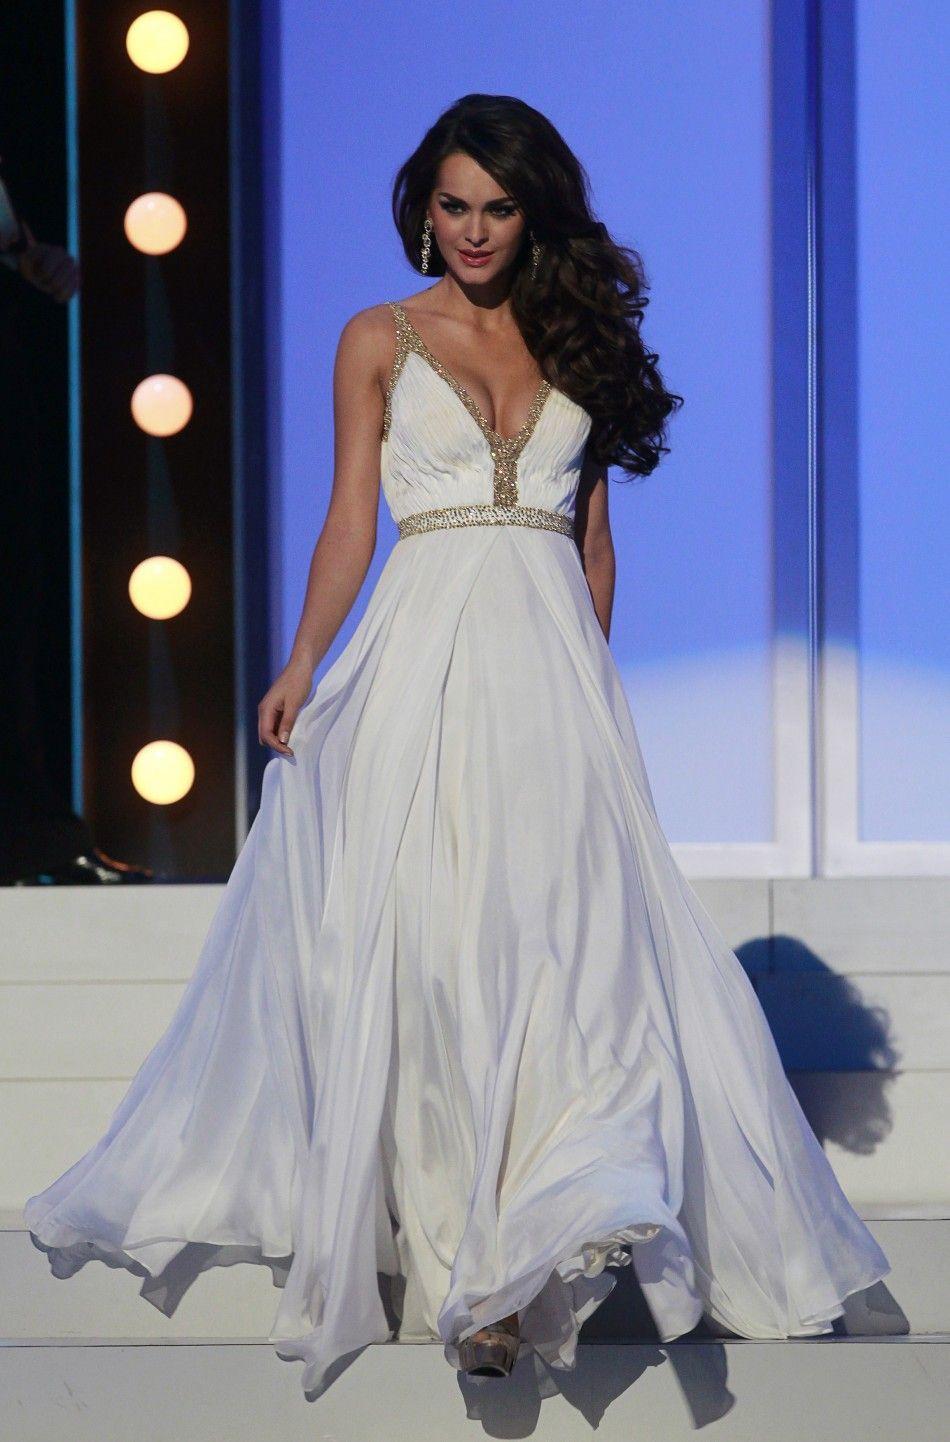 Miss Ukraine 2011 | prom | Pinterest | Universe, Ukraine and Gowns